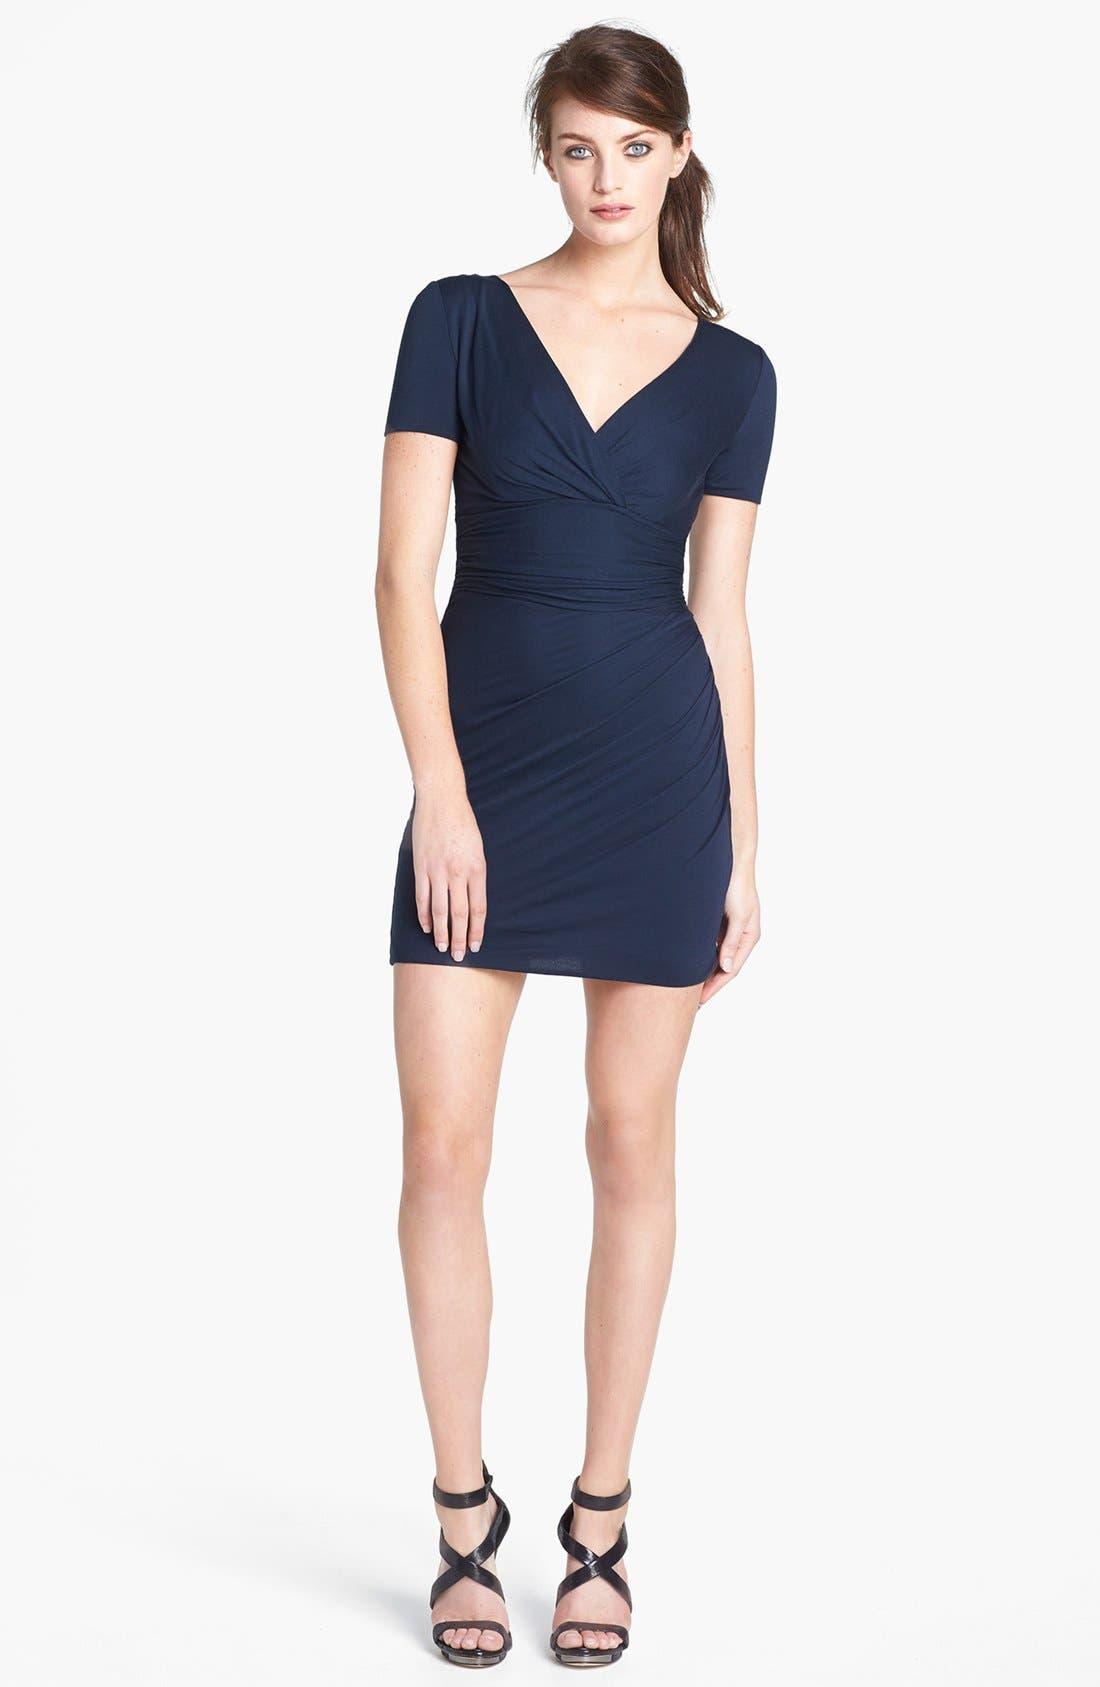 Alternate Image 1 Selected - Diane von Furstenberg 'Chelsea' Knit Dress